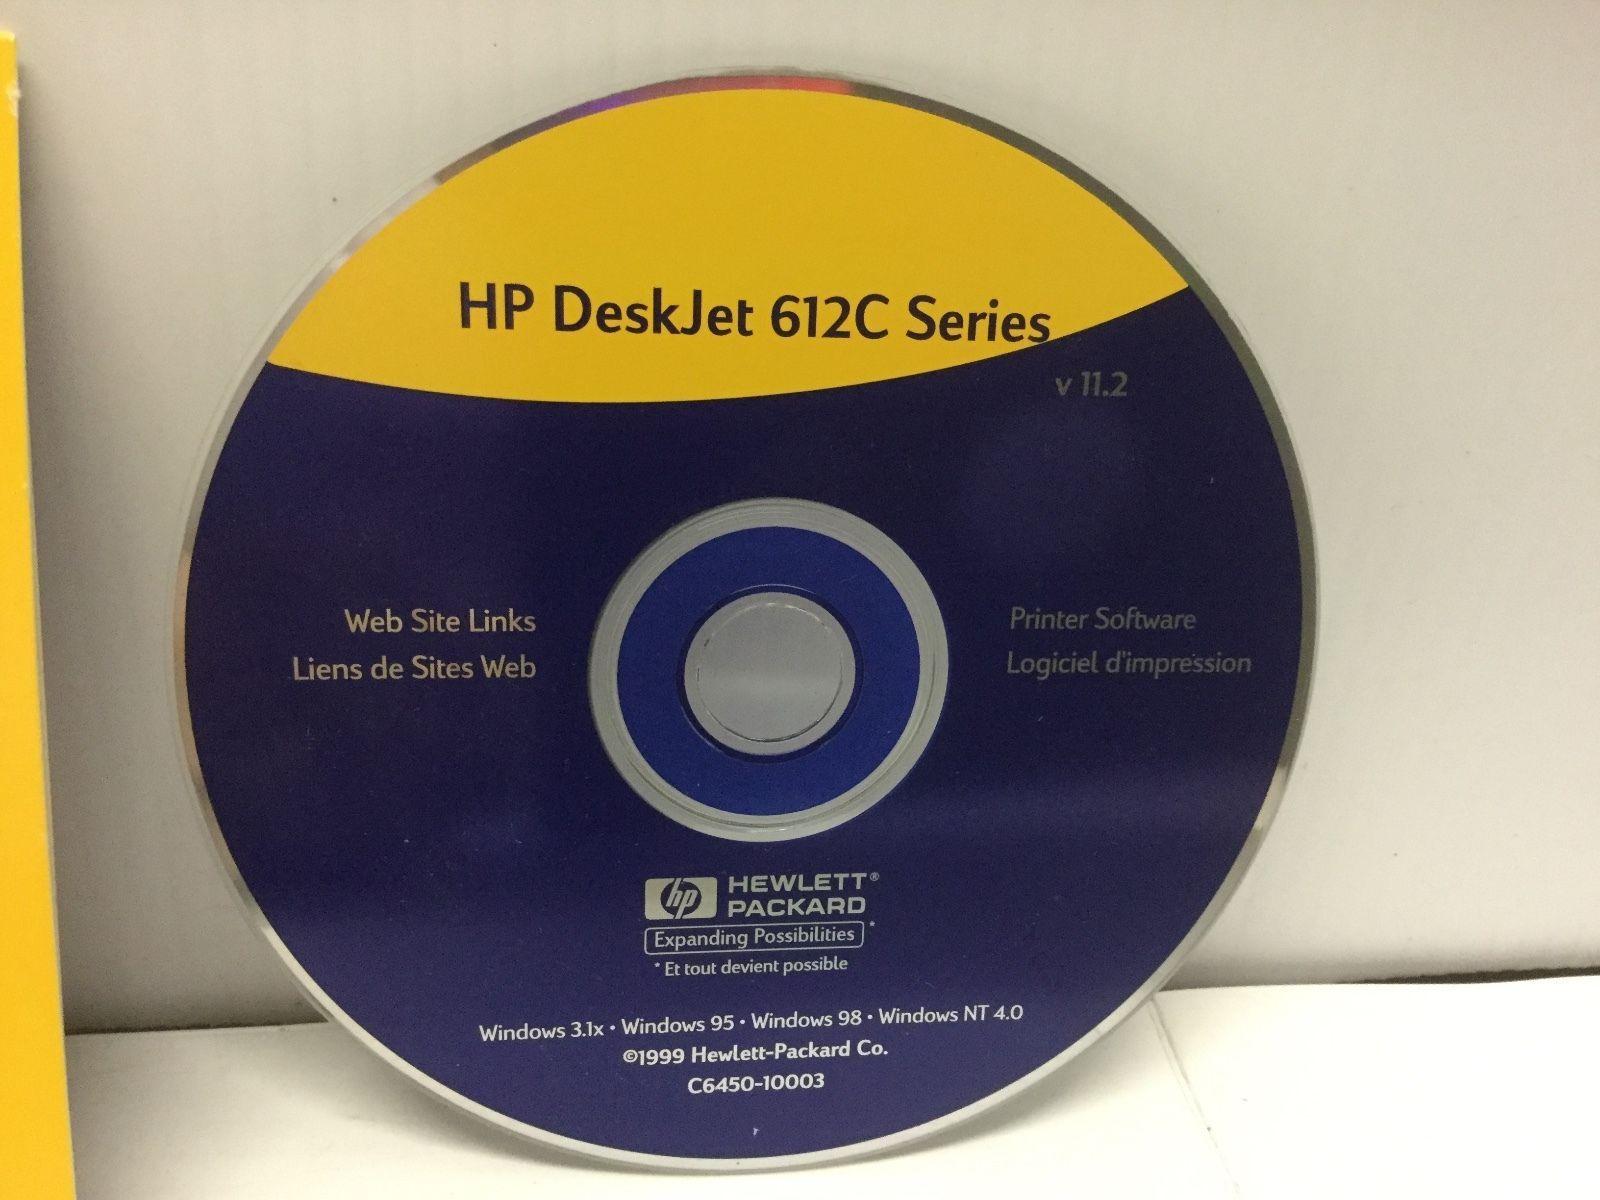 HP DeskJet 612C Series Printer Software CD and 17 similar items